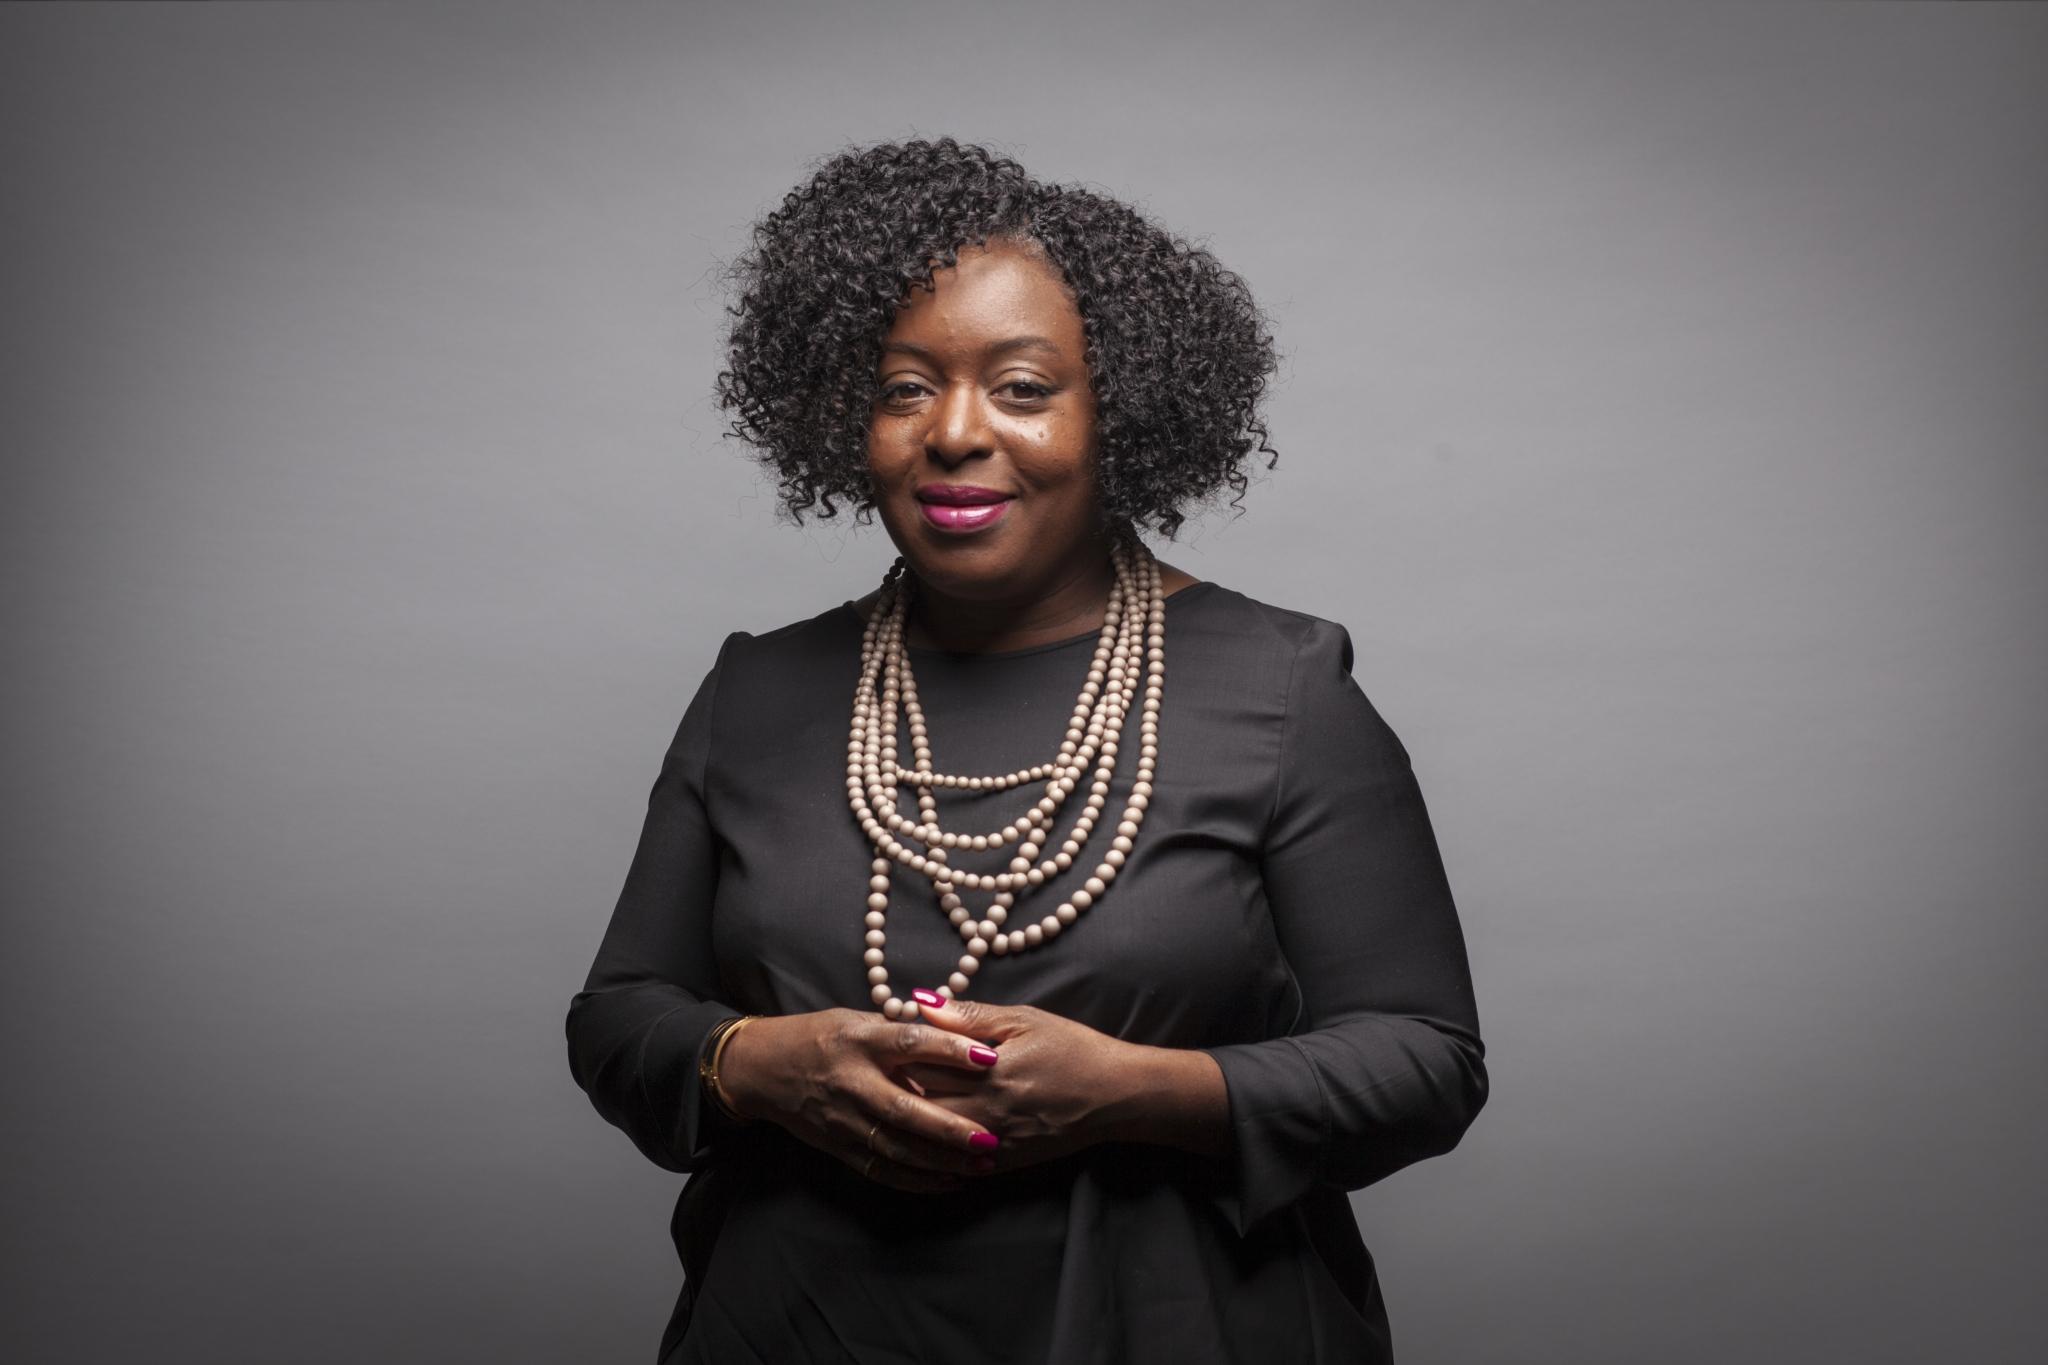 Kimberly Bryant, Black Girls Code founder, opens doors in tech